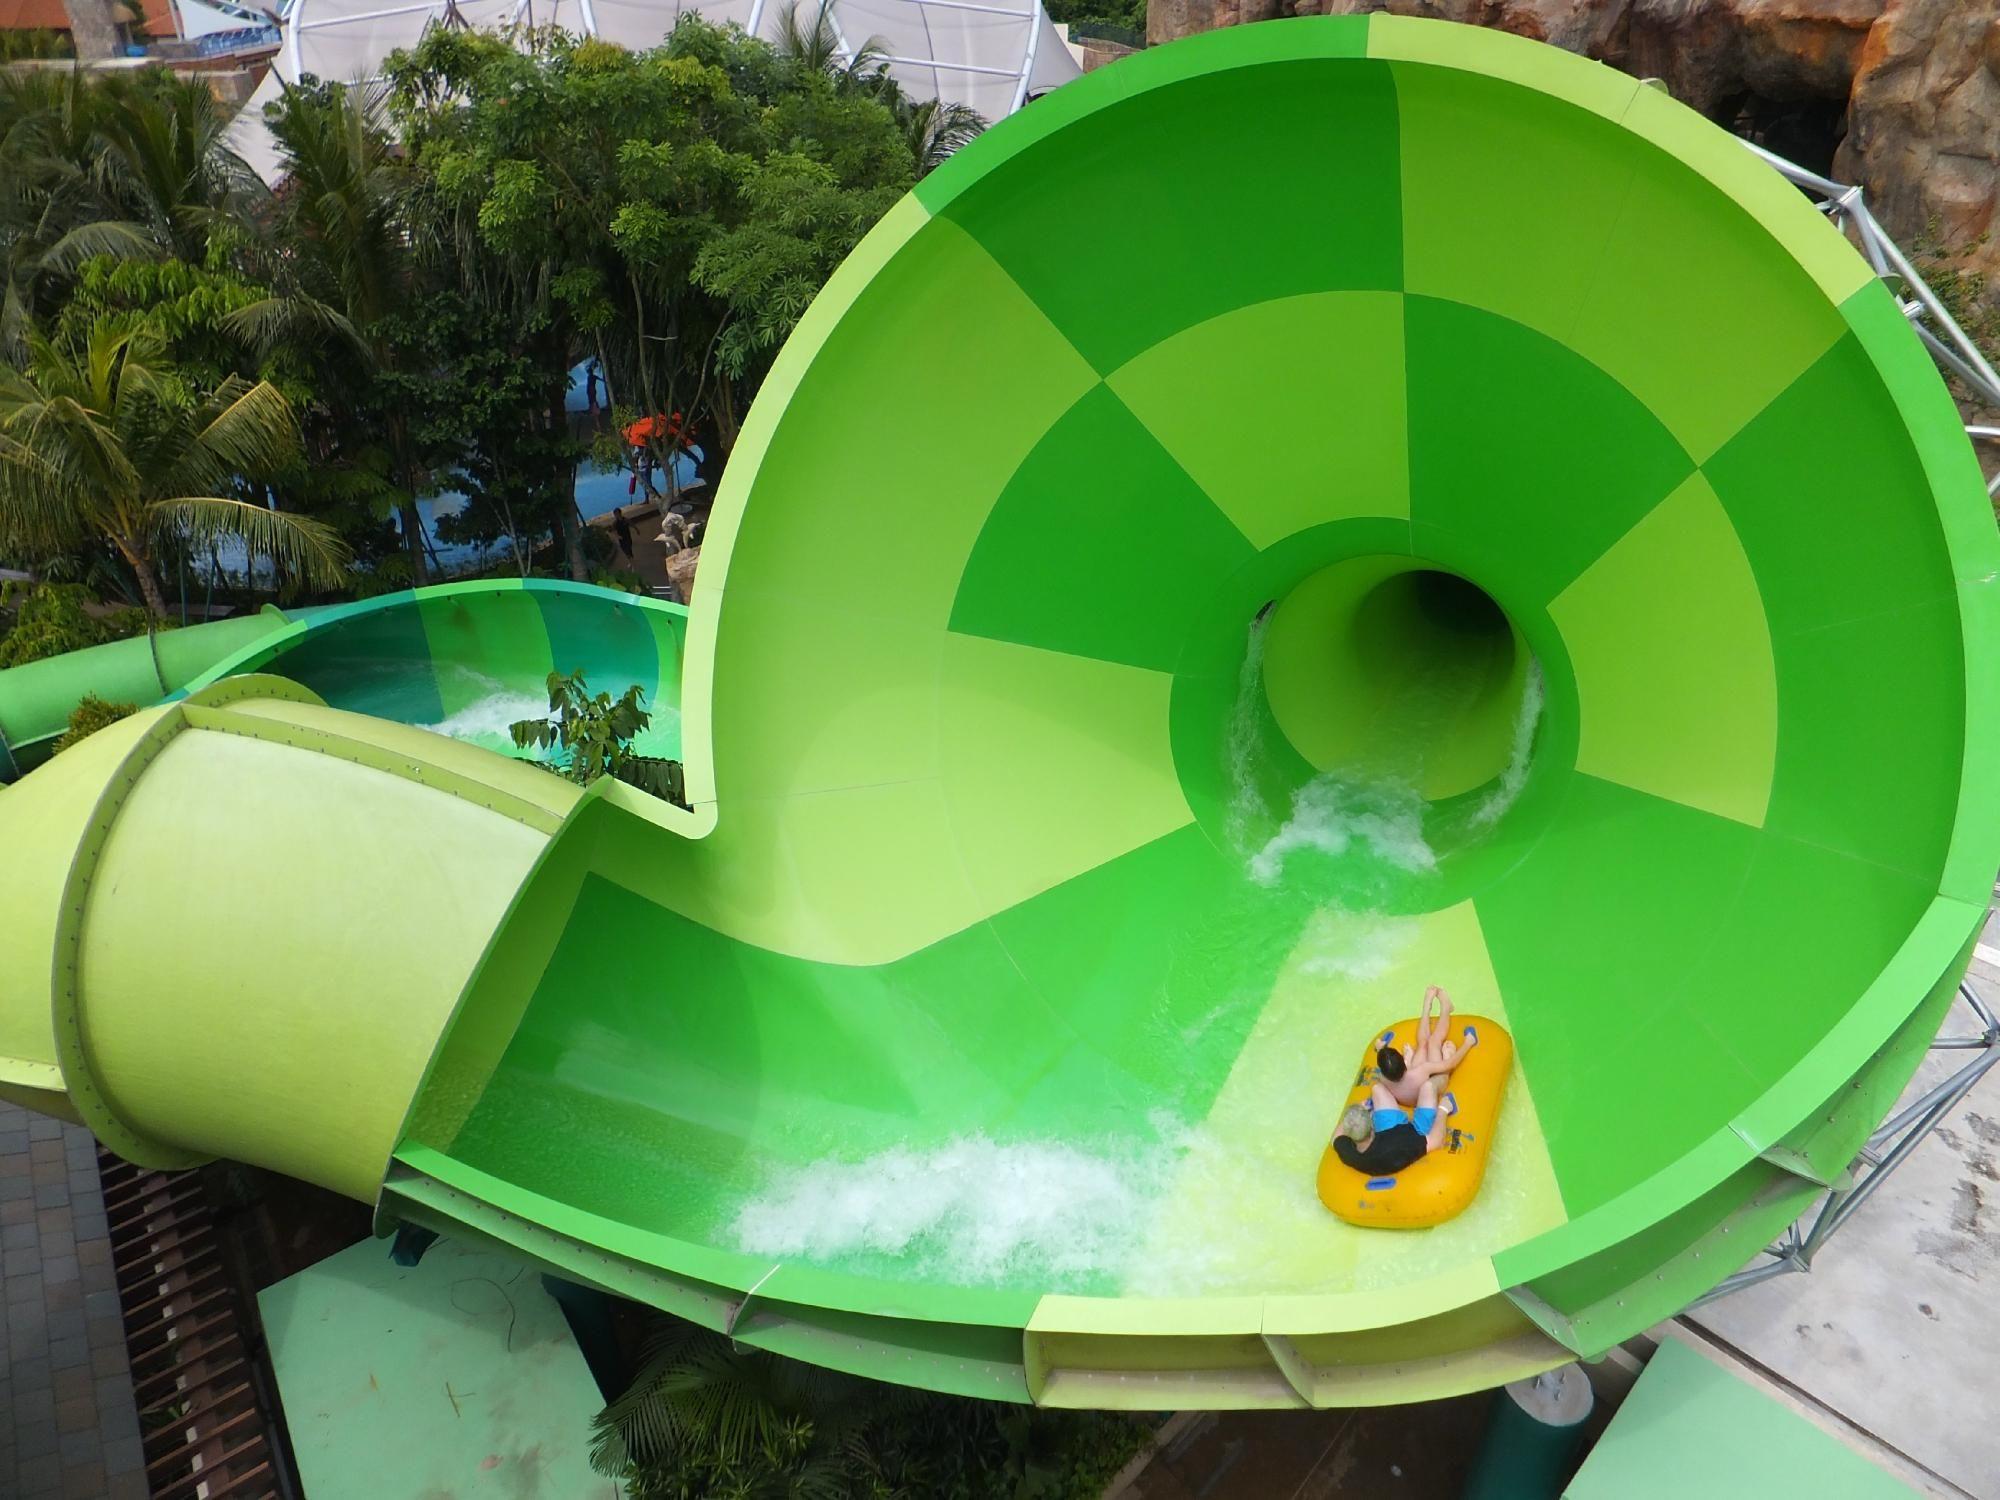 Adventure Cove Waterpark | Water park, Trip advisor, Singapore travel